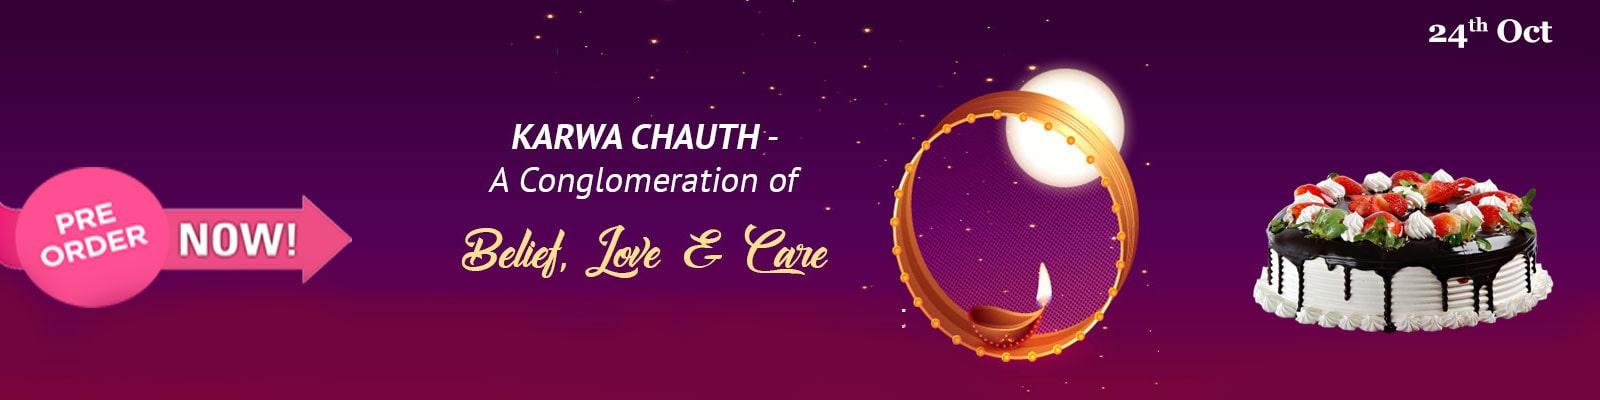 Send karwa chauth Gifts